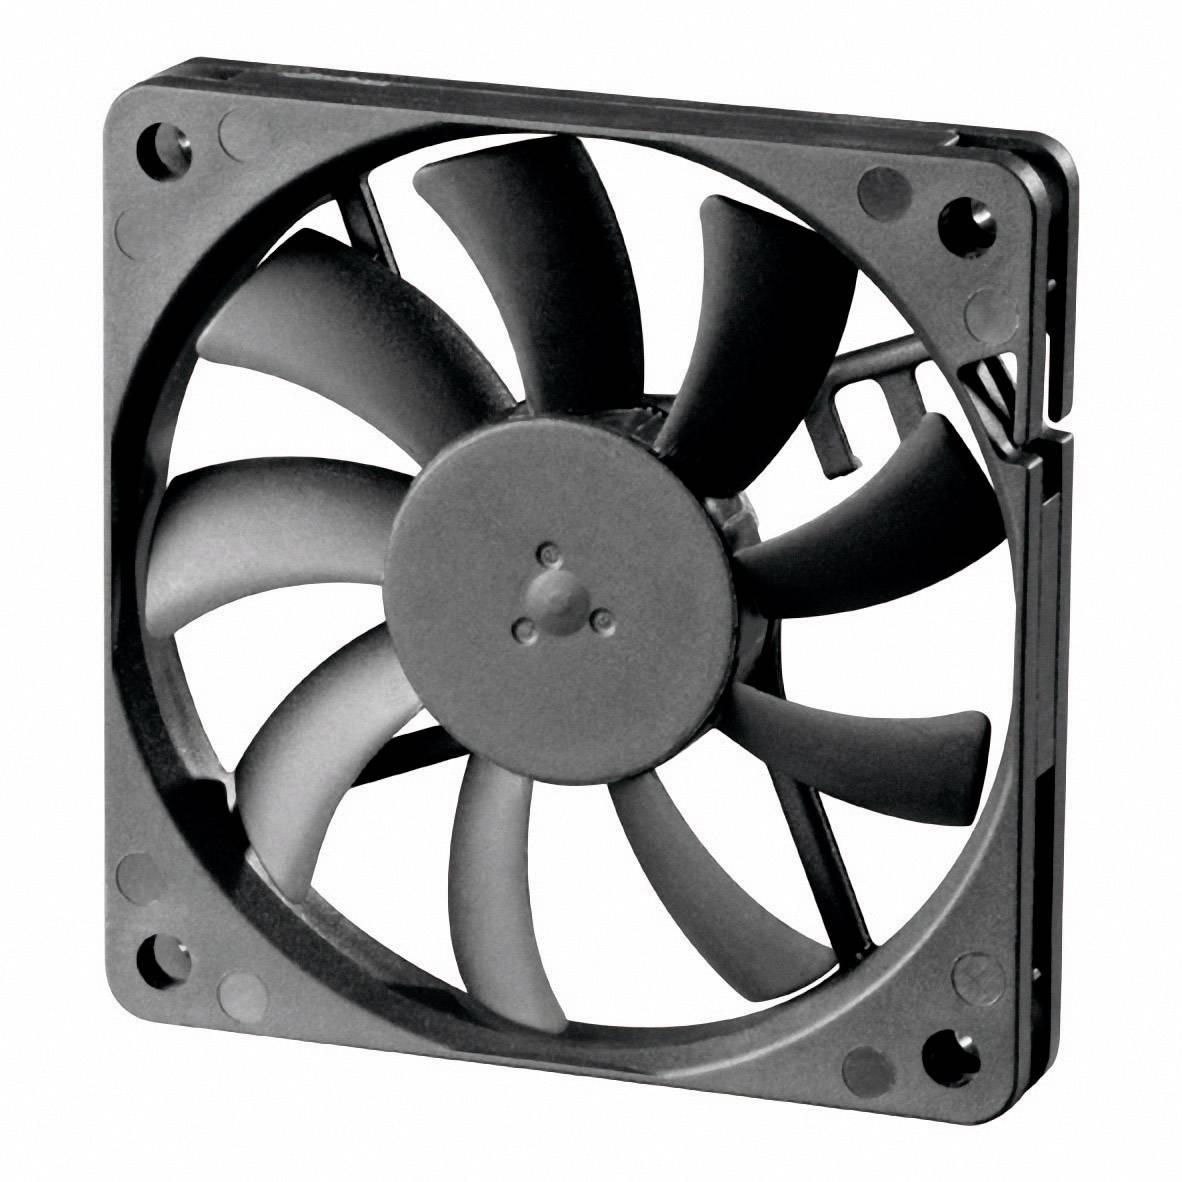 Ventilátor Sunon DR MB70101V2-0000-A99, 70 x 70 x 10 mm, 12 V/DC